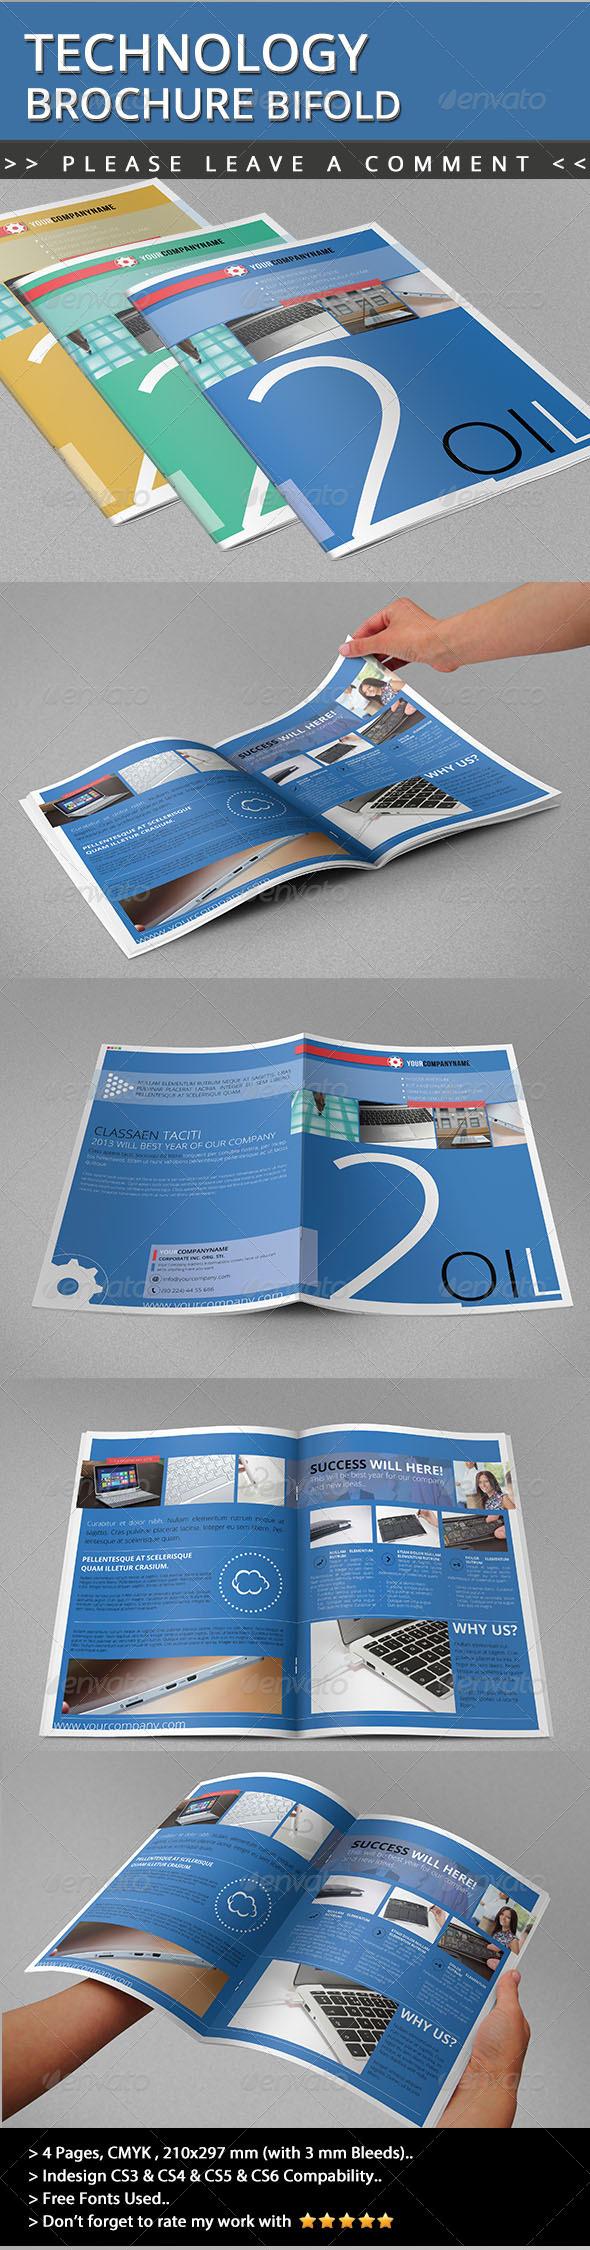 Technology Brochure Bifold - Informational Brochures